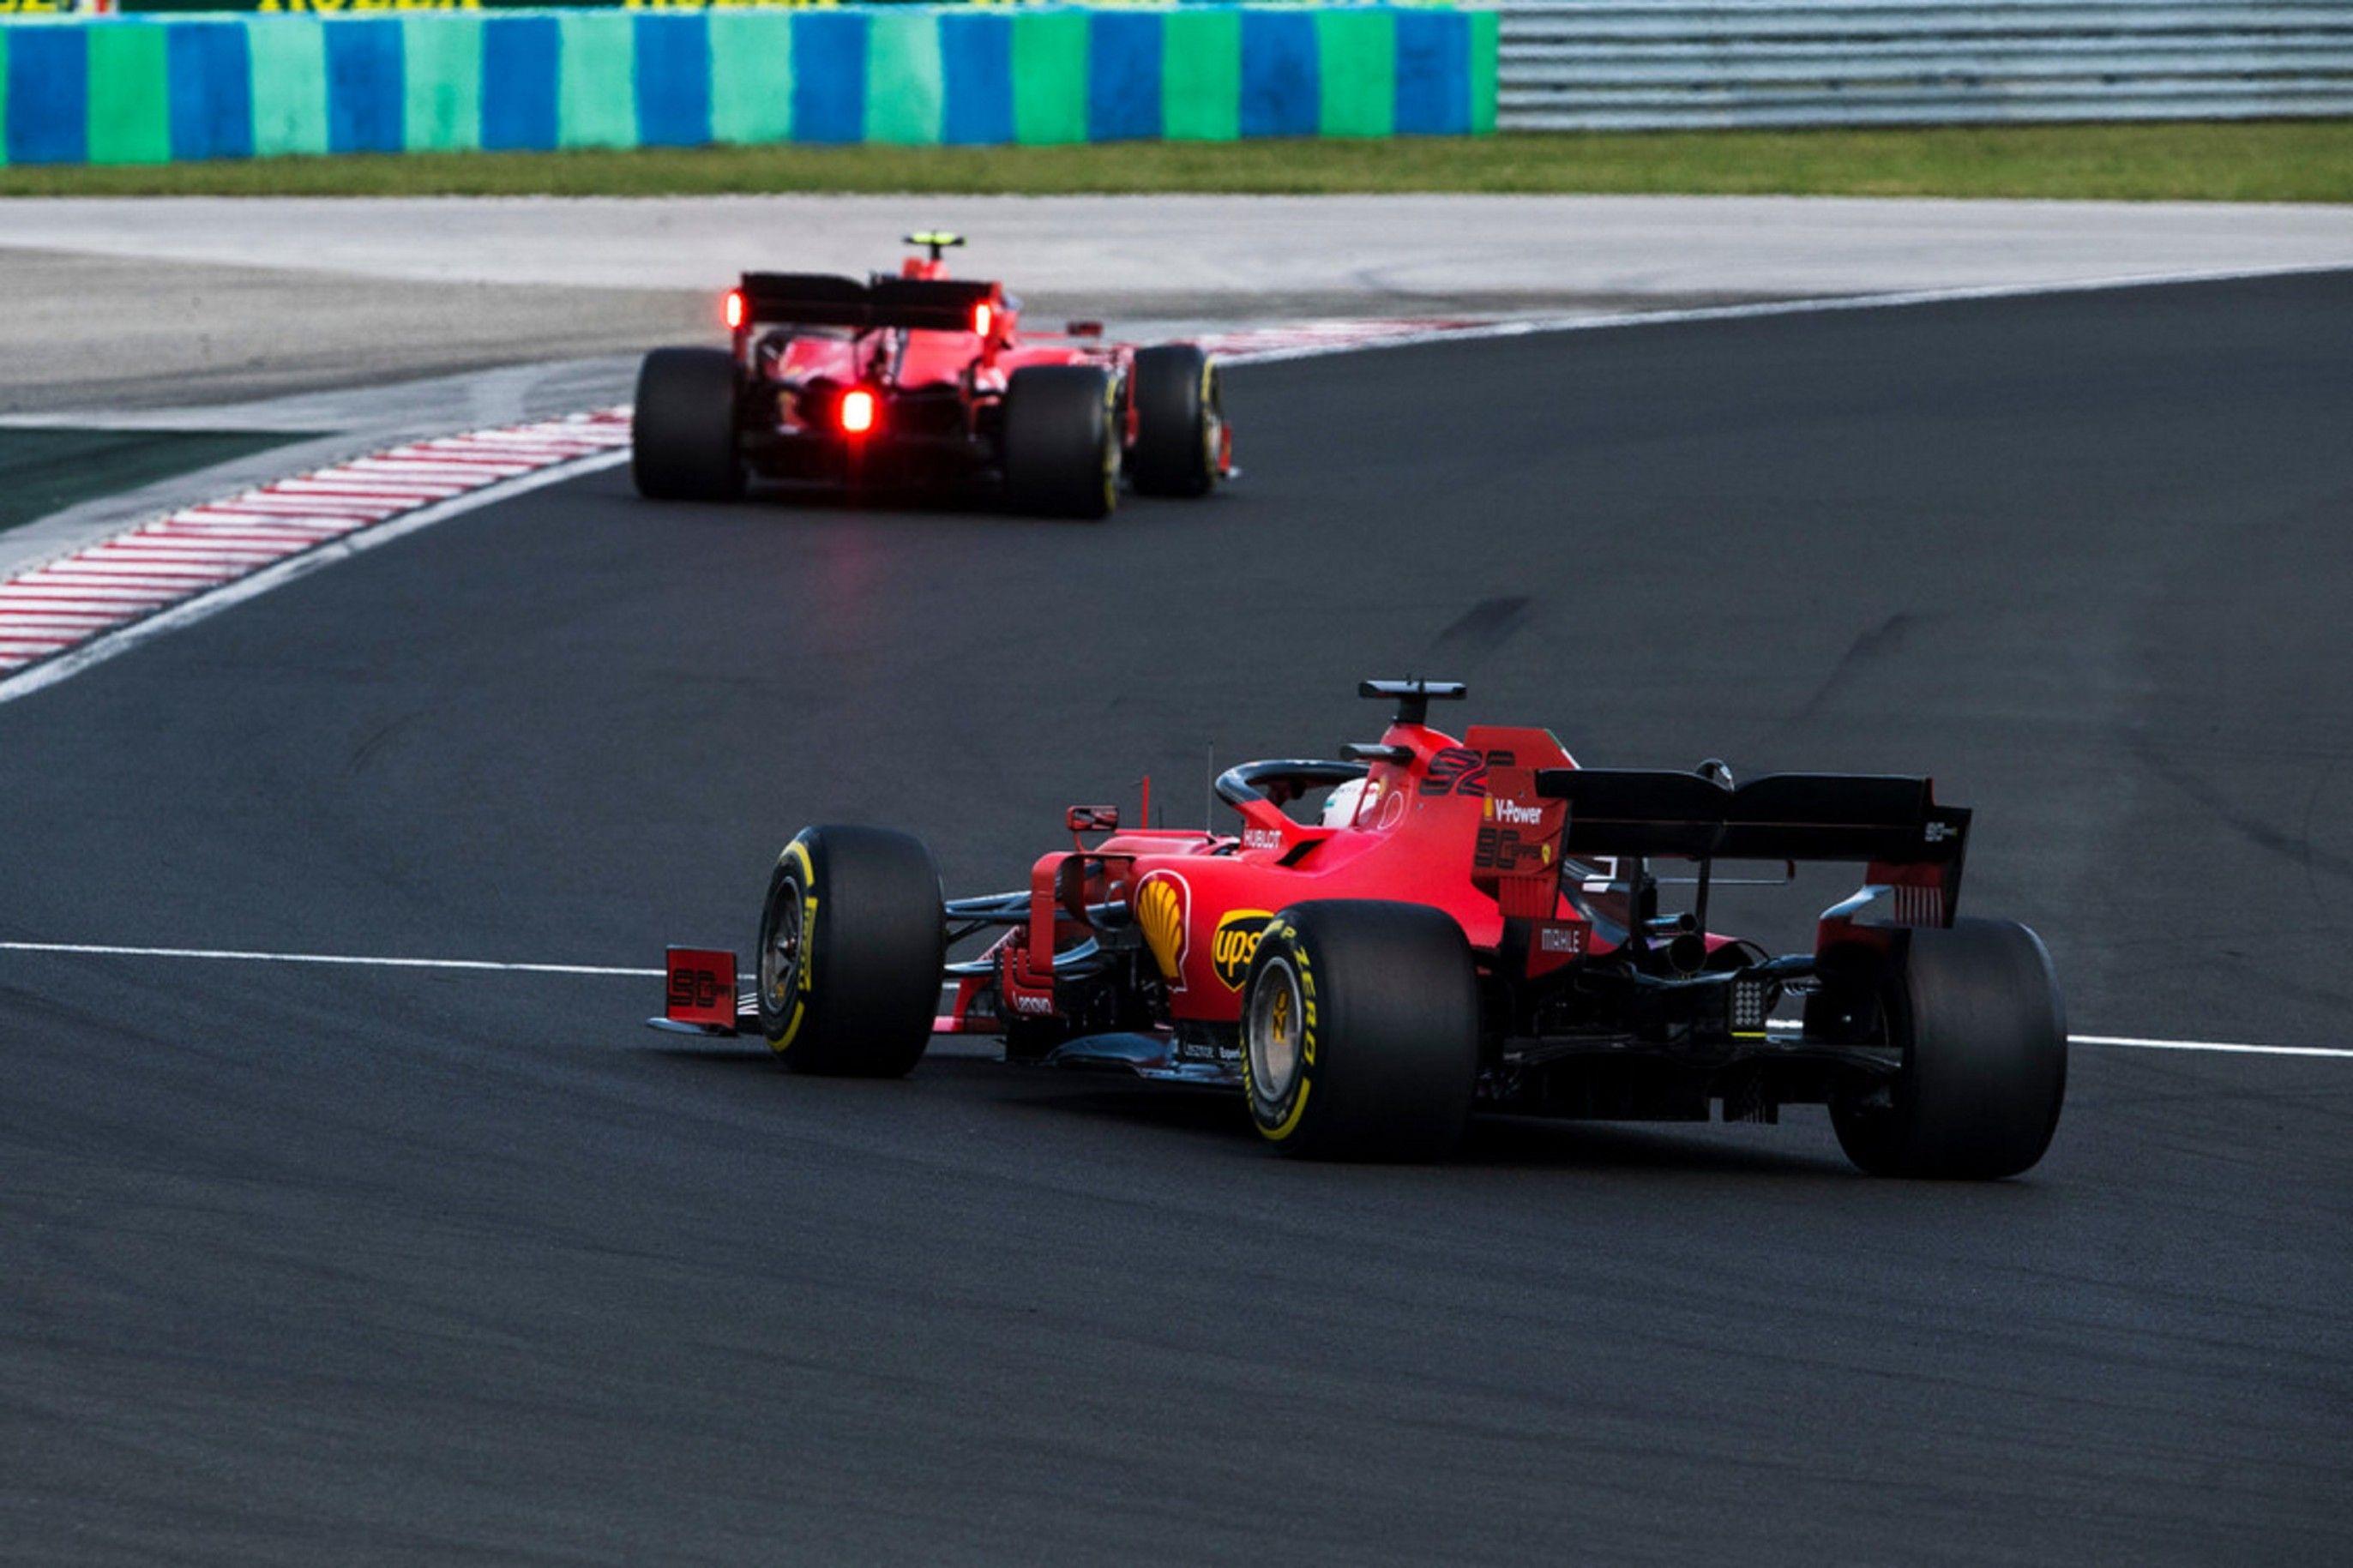 F1 2020 Ferrari Vettel Configurations